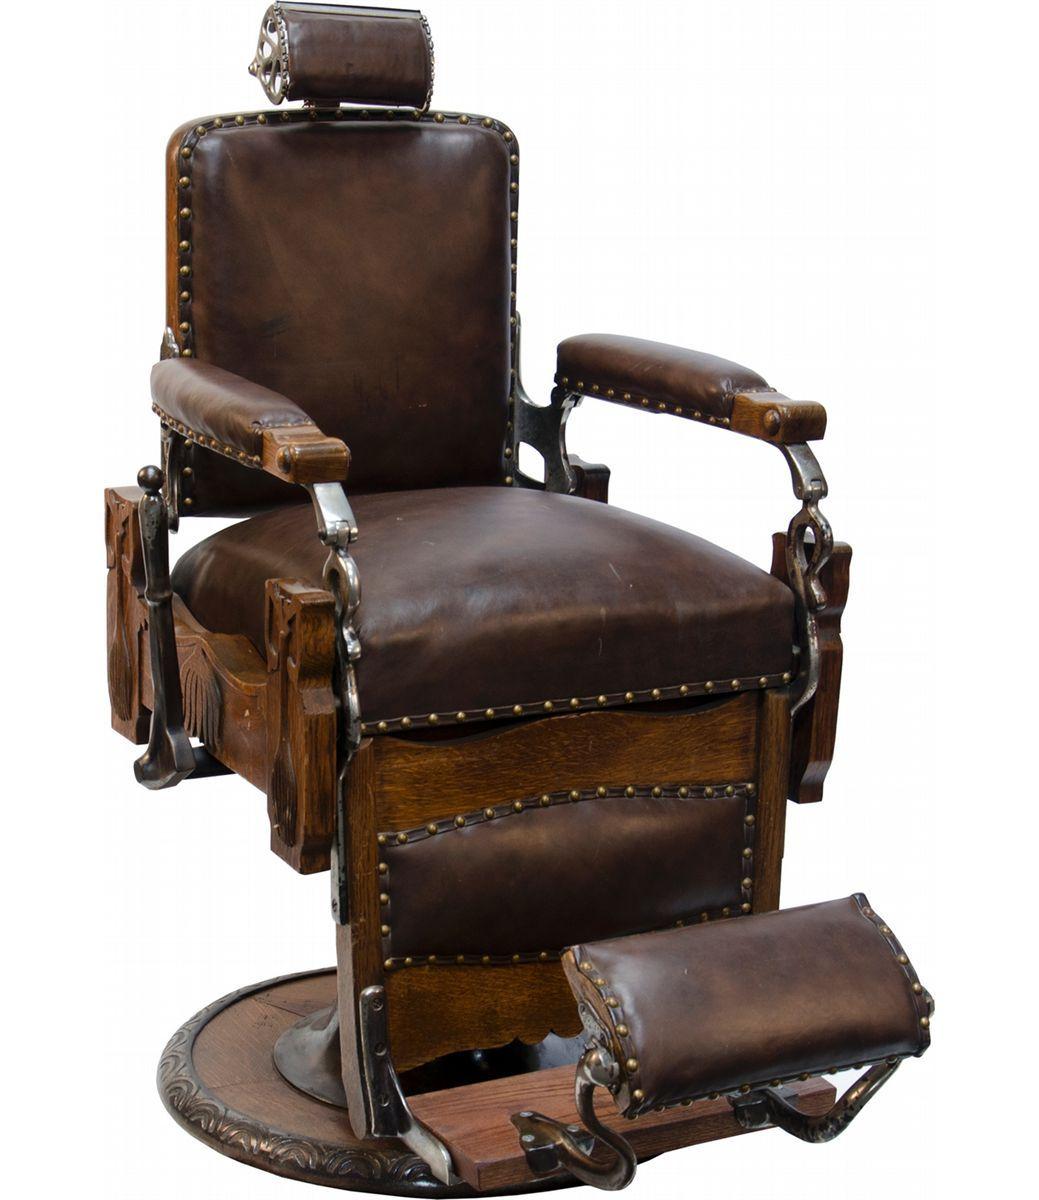 Barber shop koken barber chair